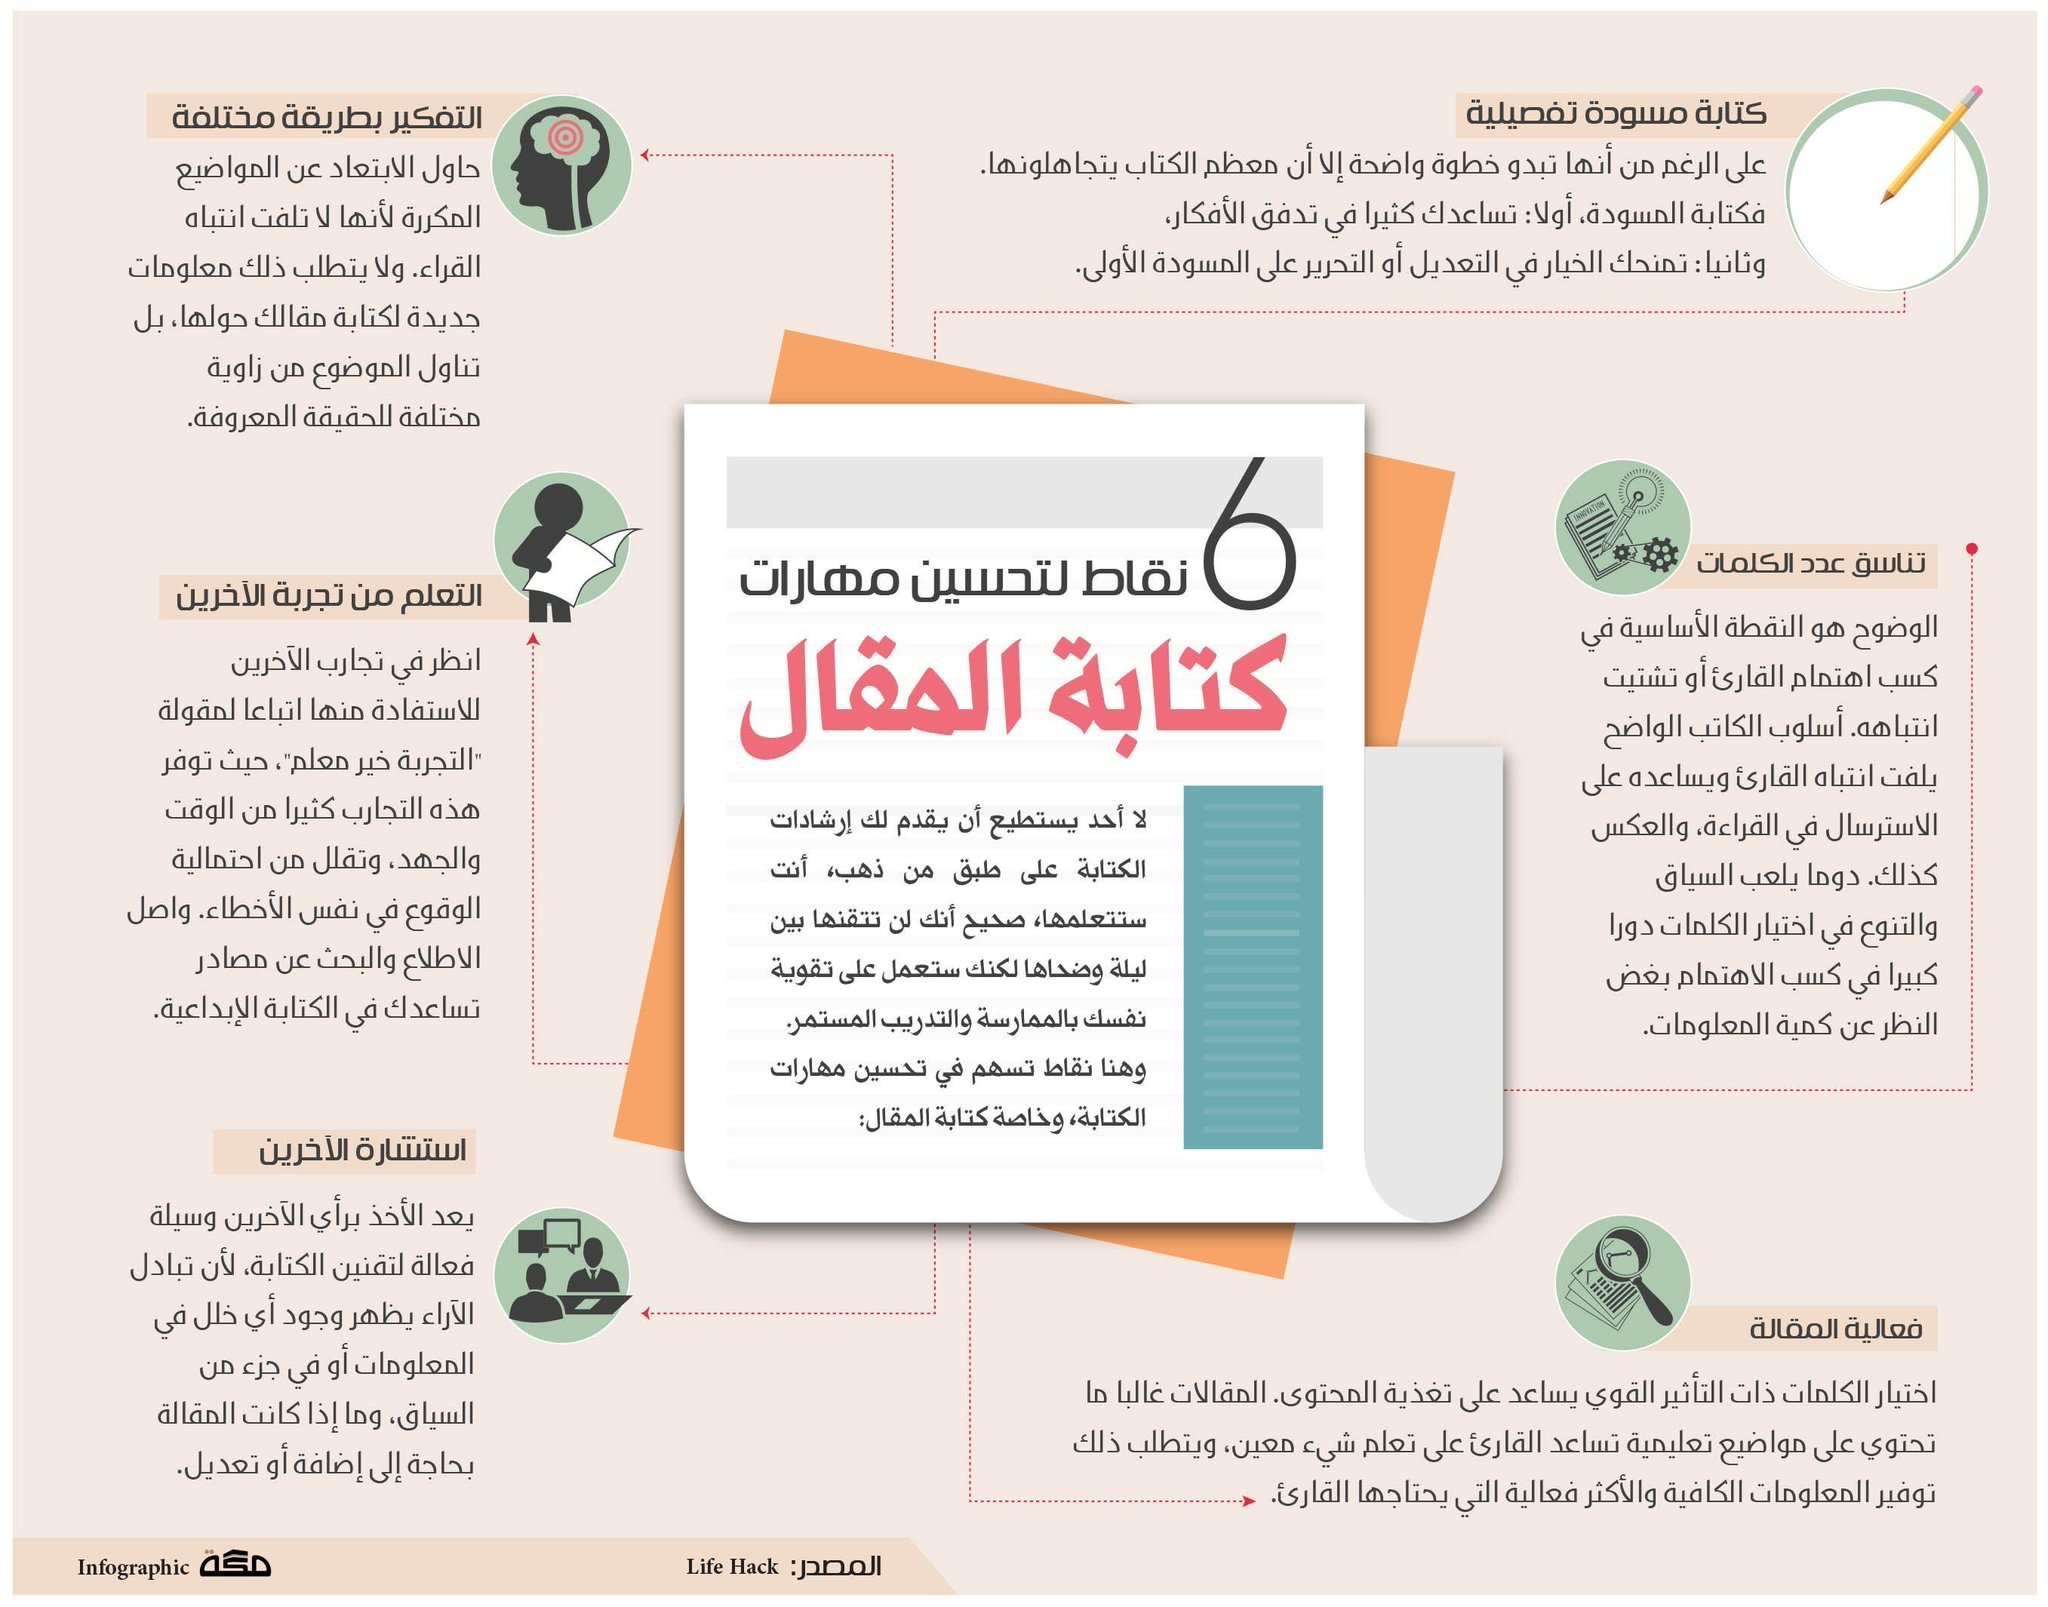 Pin By Fatin Alsaleh On انفوجرافيك List Of Courses College List University Courses